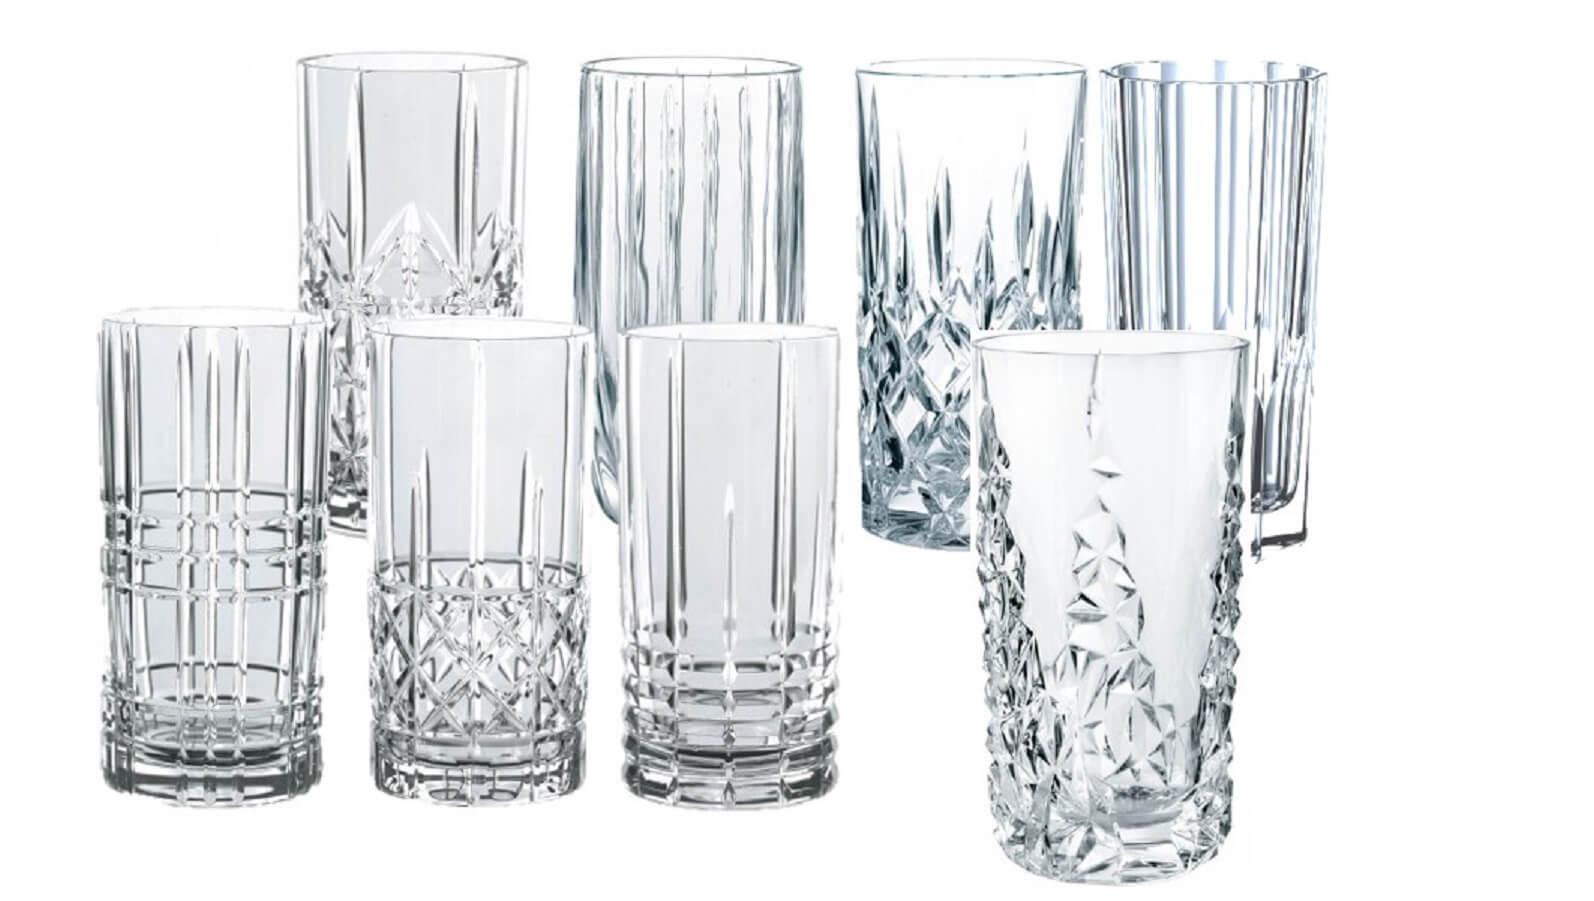 nachtmann-highball-longdrink-krystal-glas-aspen-highland-noblesse-prestige-palais-sculpture-mixmeister.dk